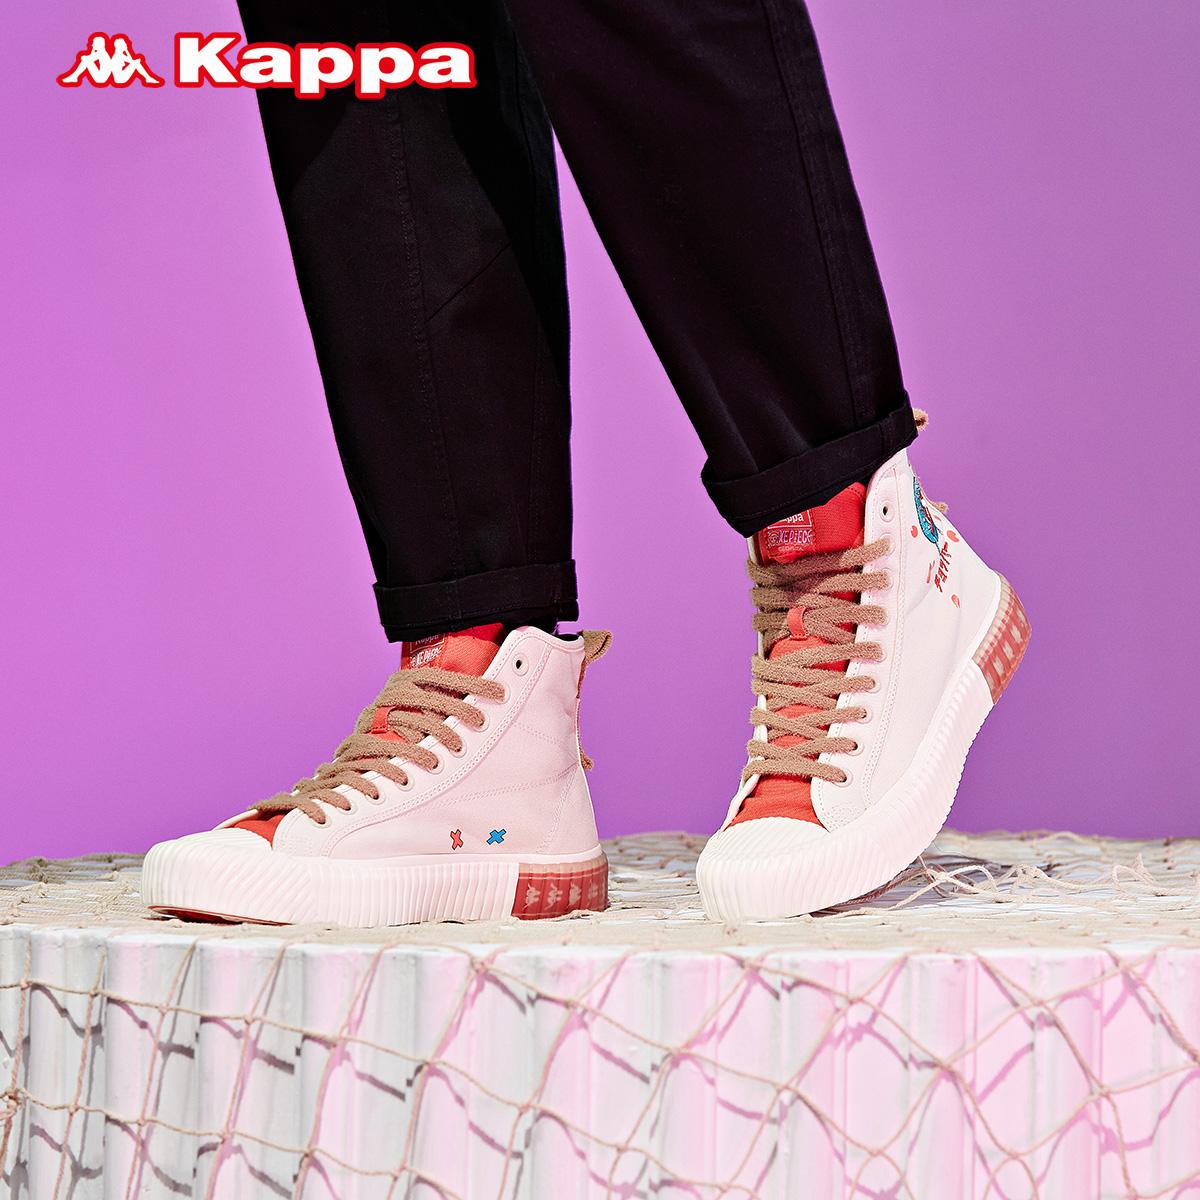 Kappa 卡帕 海贼王联名 KPCBGVS54C 情侣款串标高帮板鞋